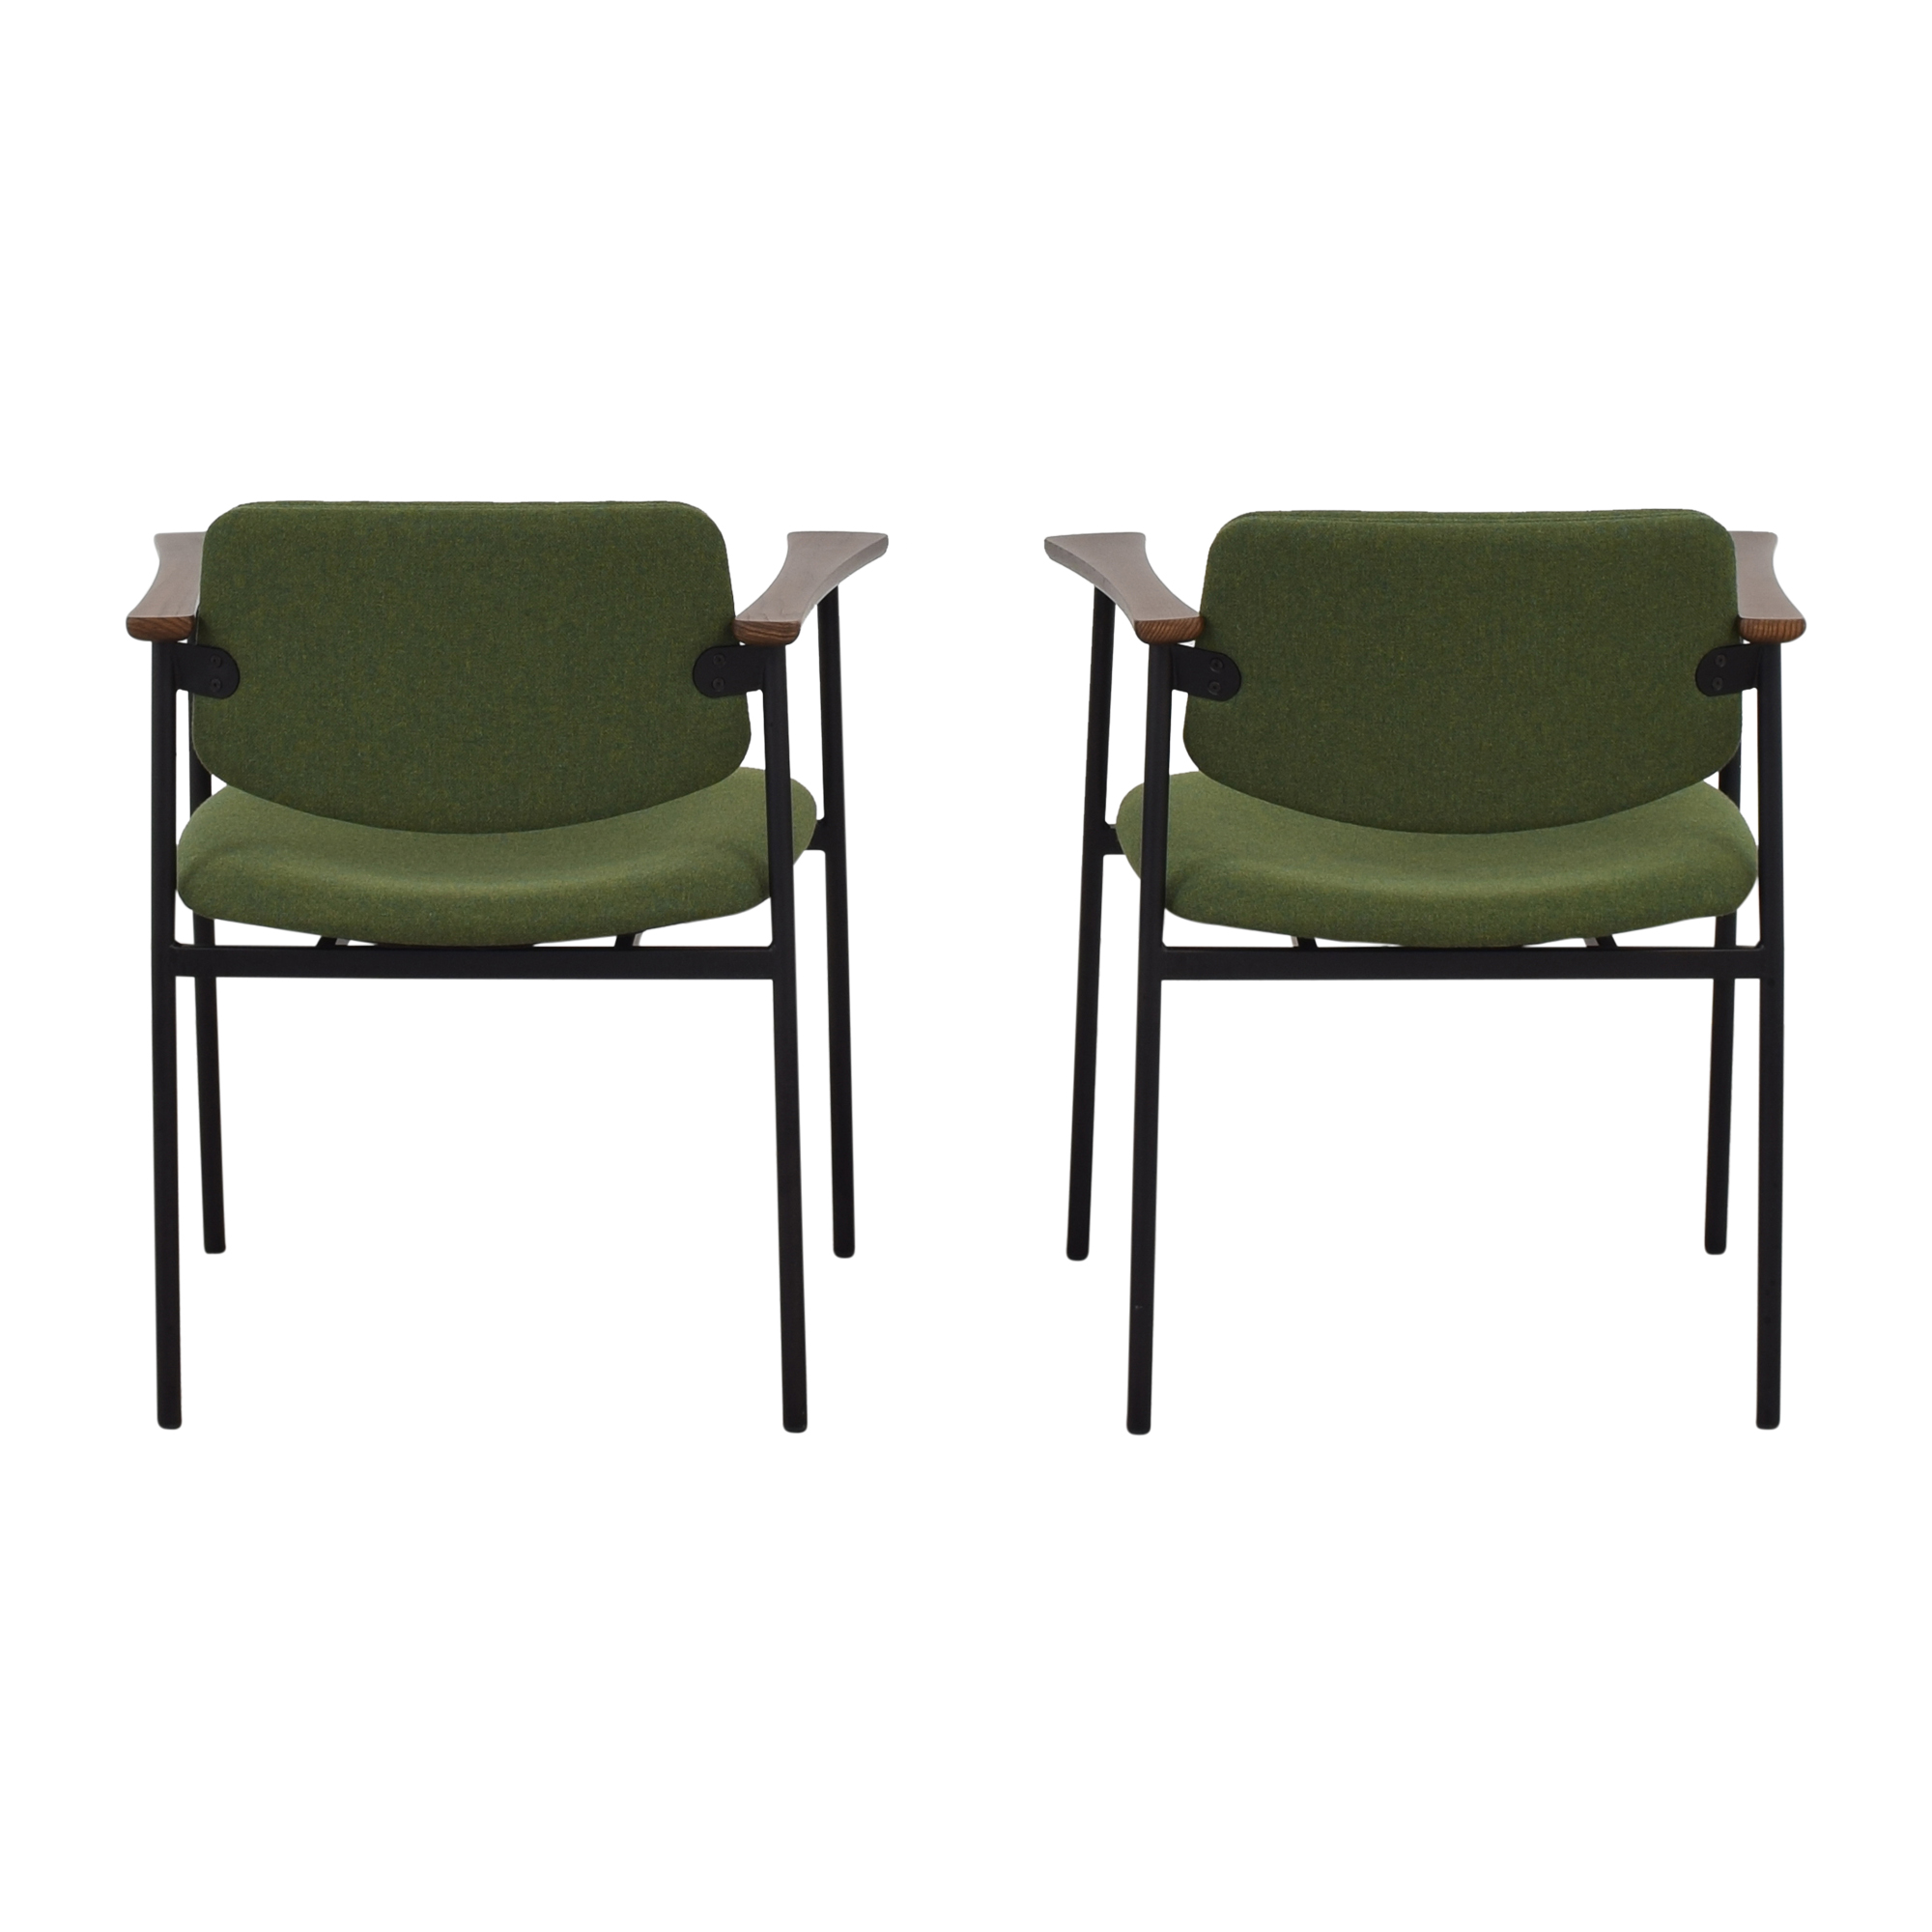 CB2 CB2 Warren Green Chairs discount